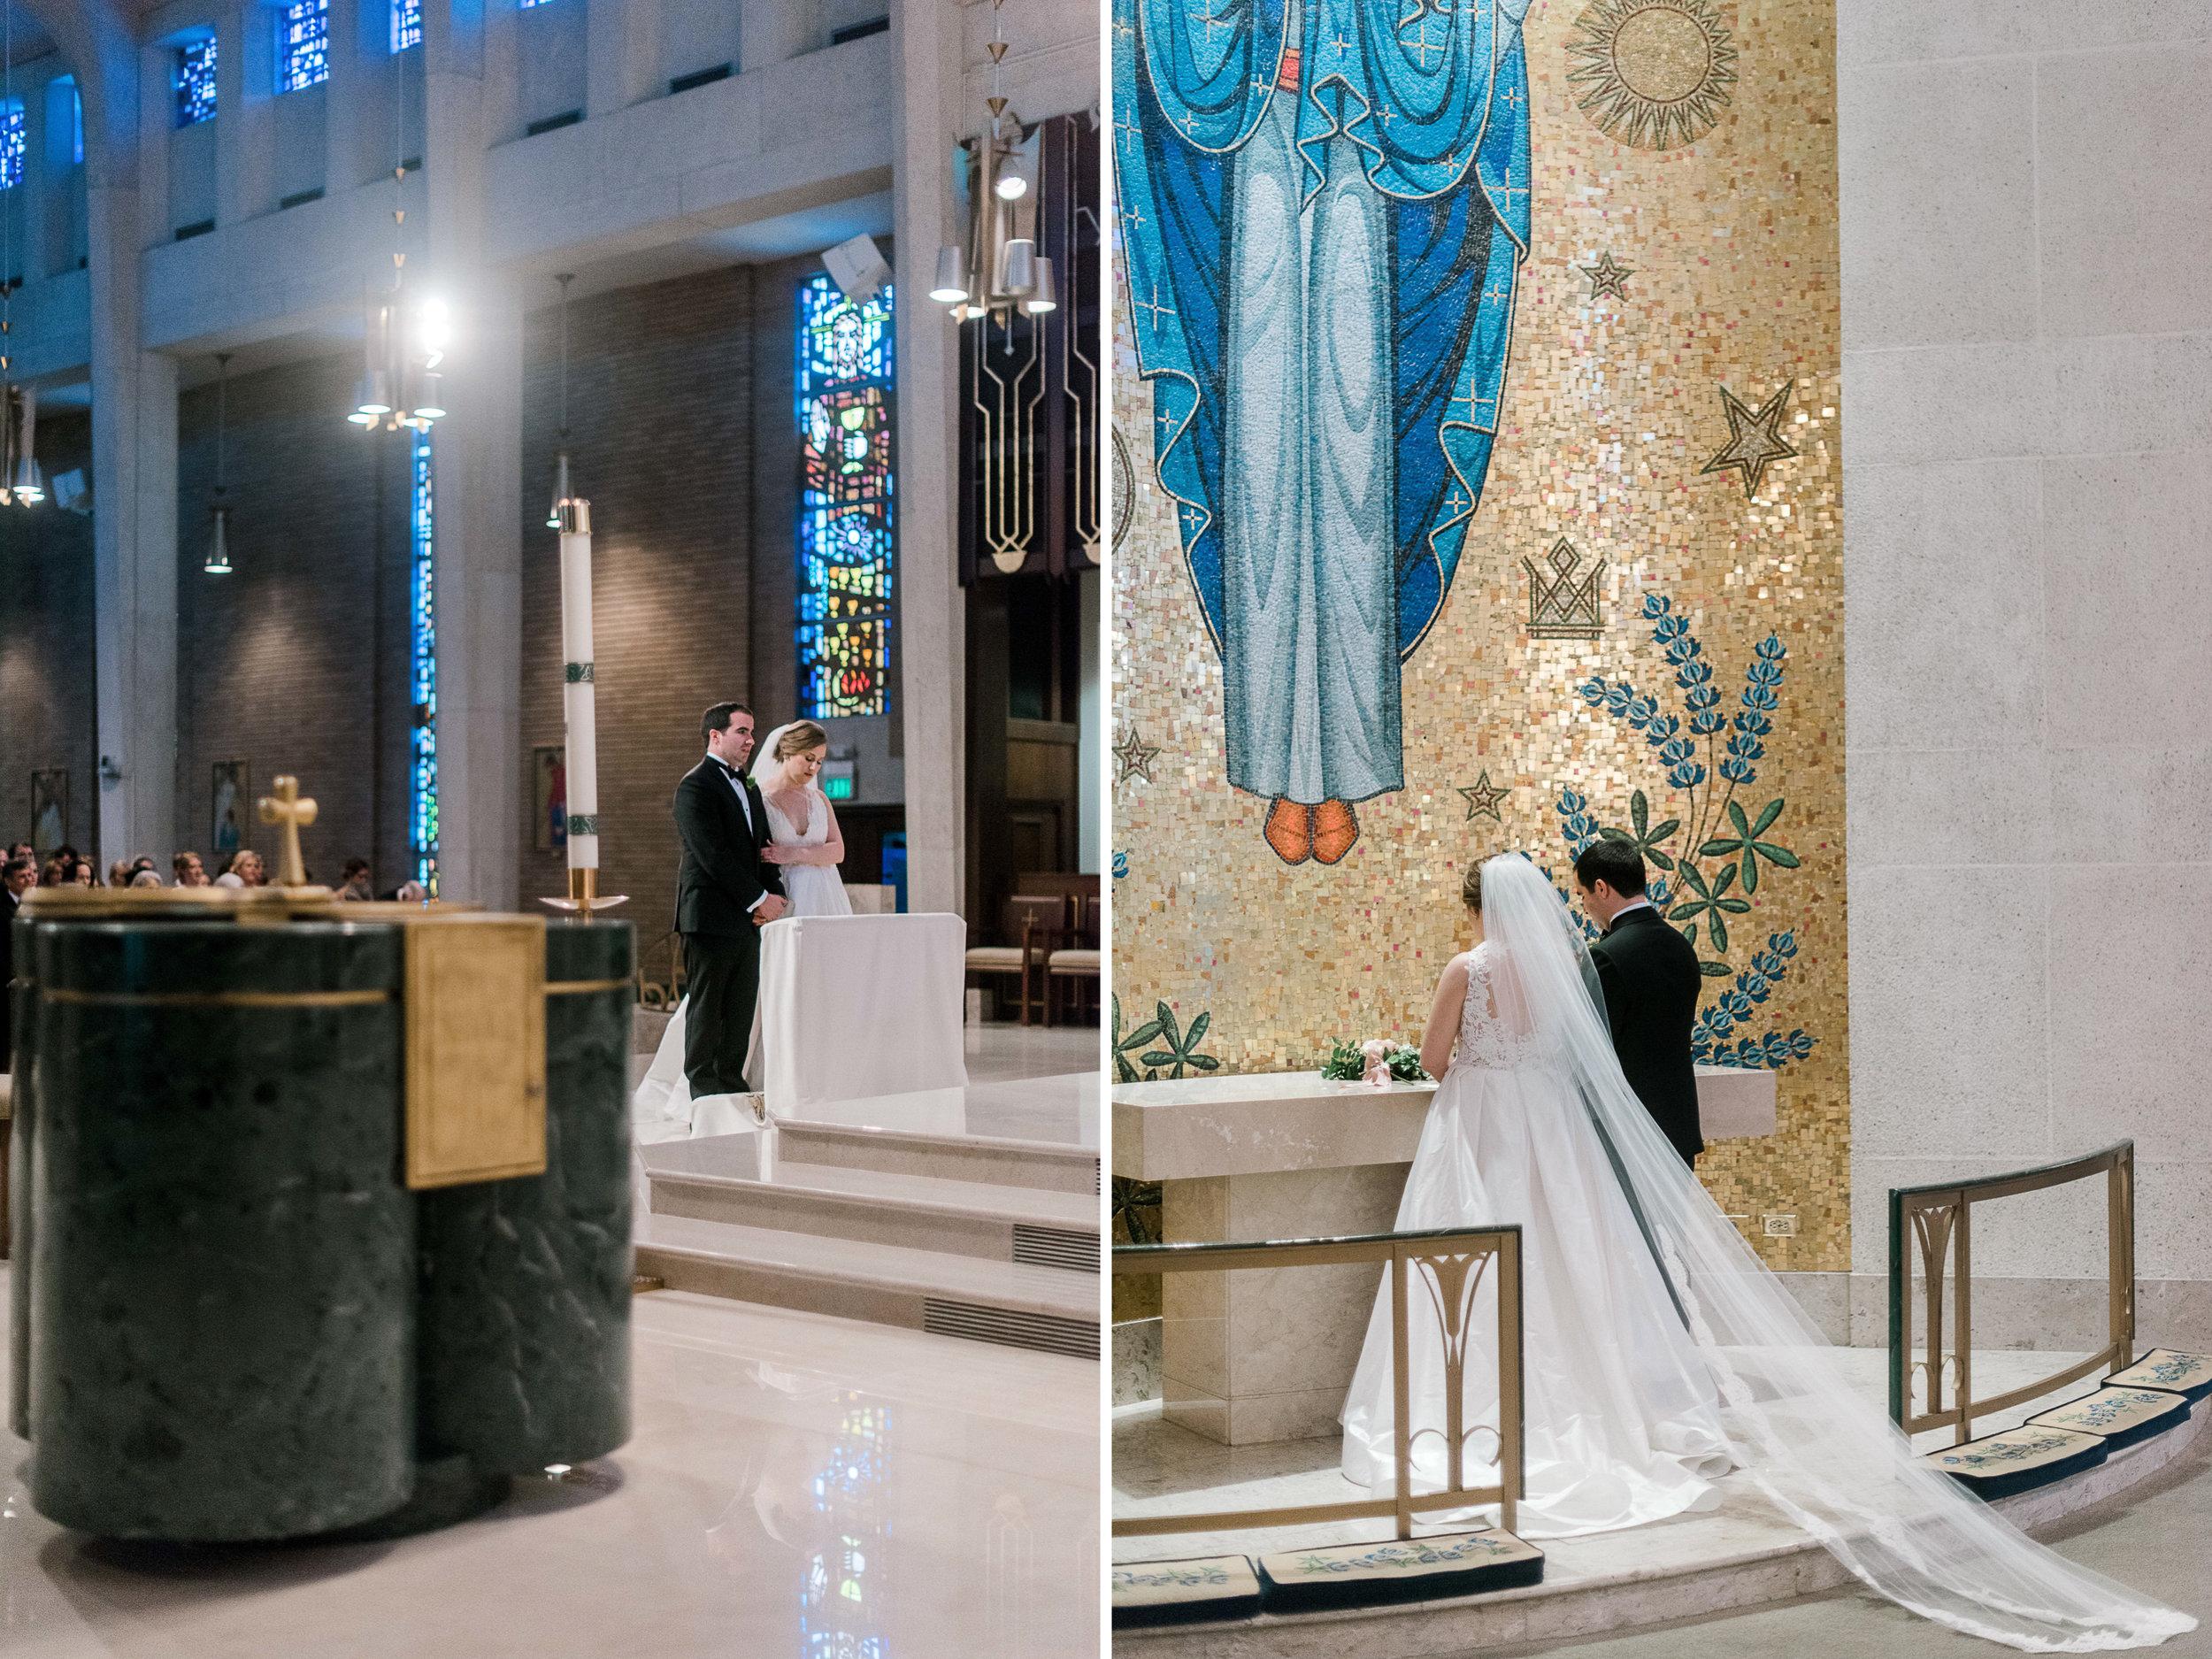 St-Michaels-Catholic-Church-Houston-Wedding-Ceremony-Josh-Dana-Fernandez-Photographer-Destination-Austin-Dallas-Fine-Art-Film-105.jpg